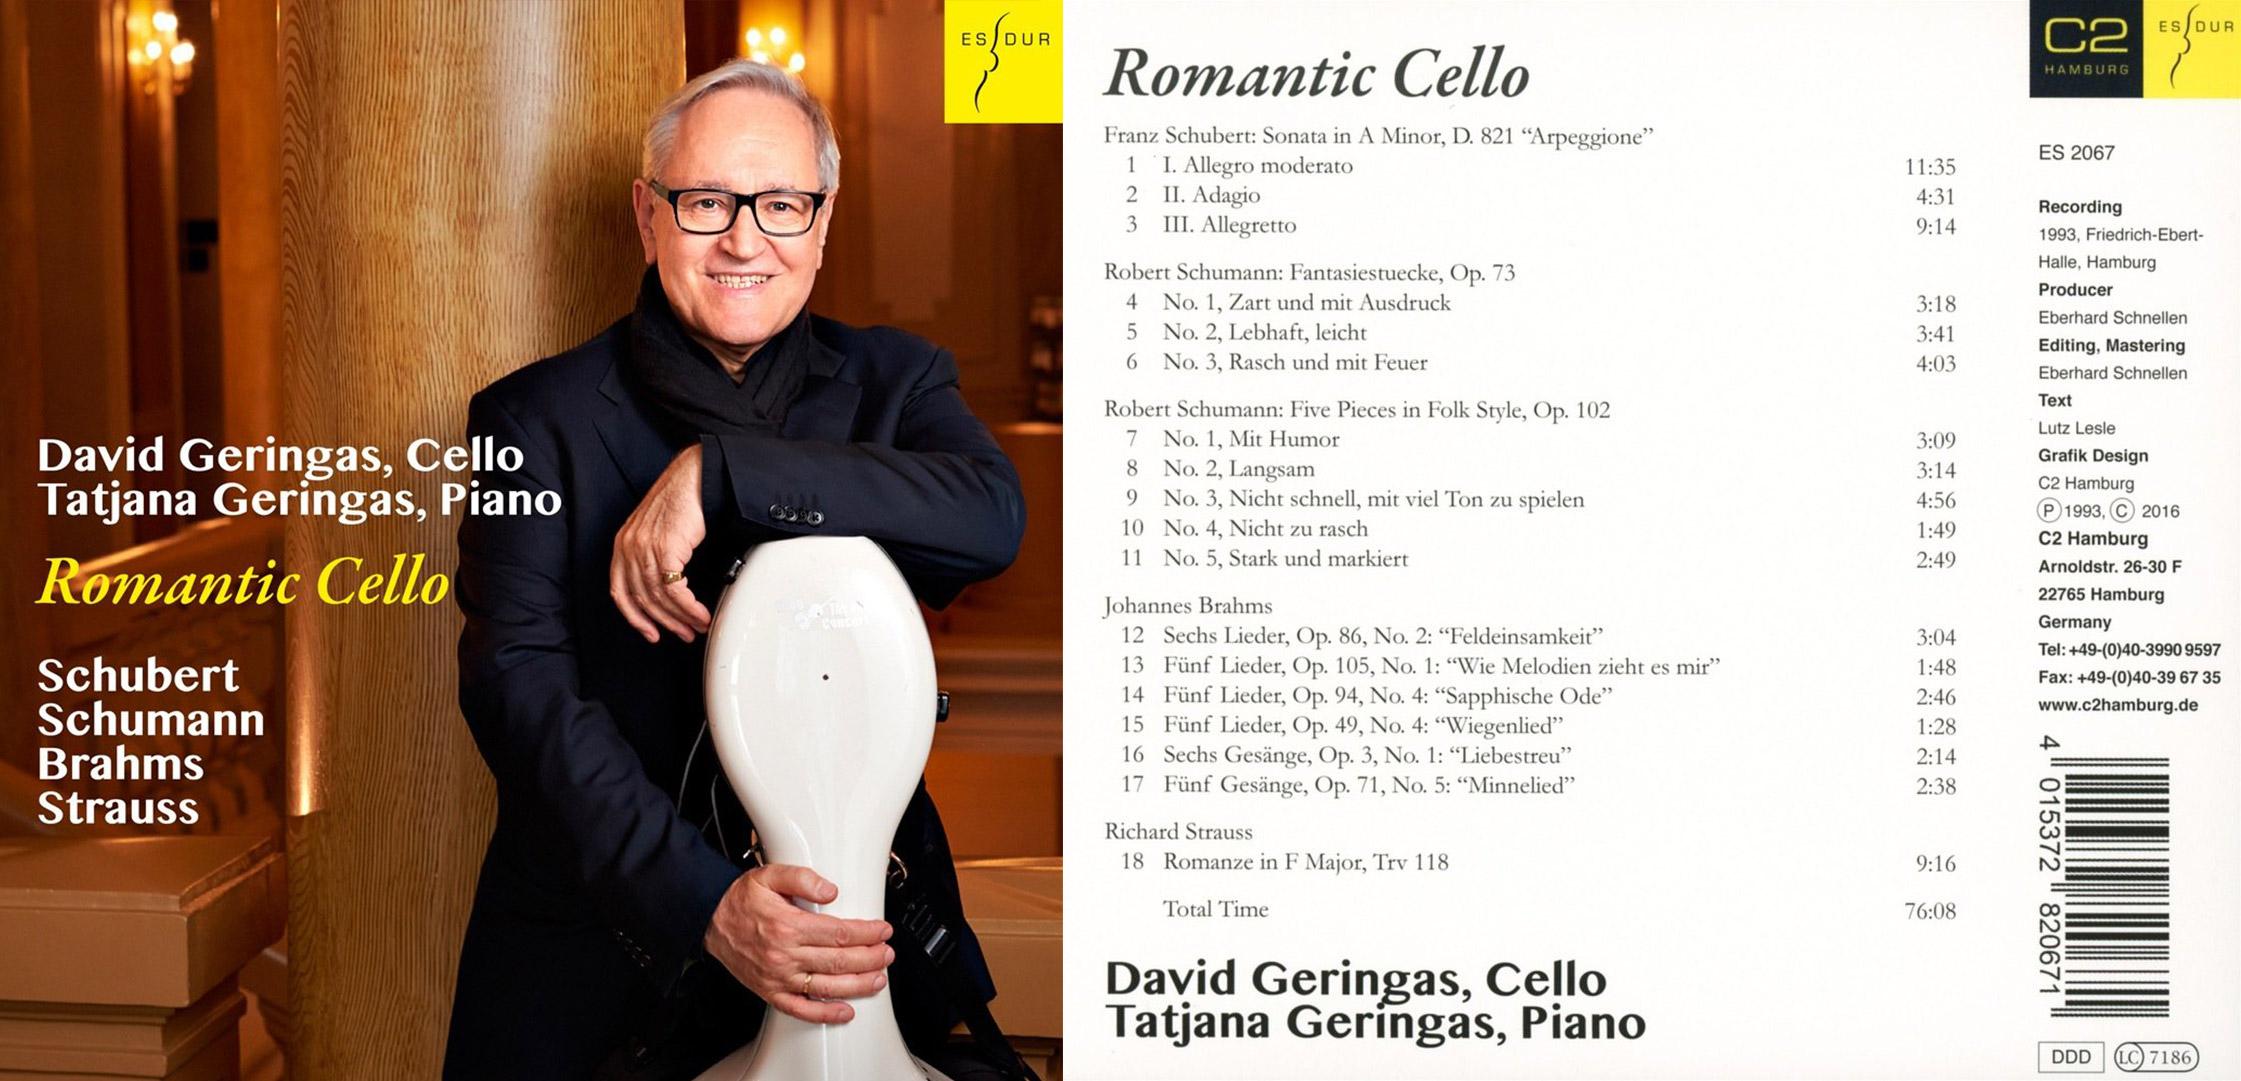 c2hamburg | Romantic Cello